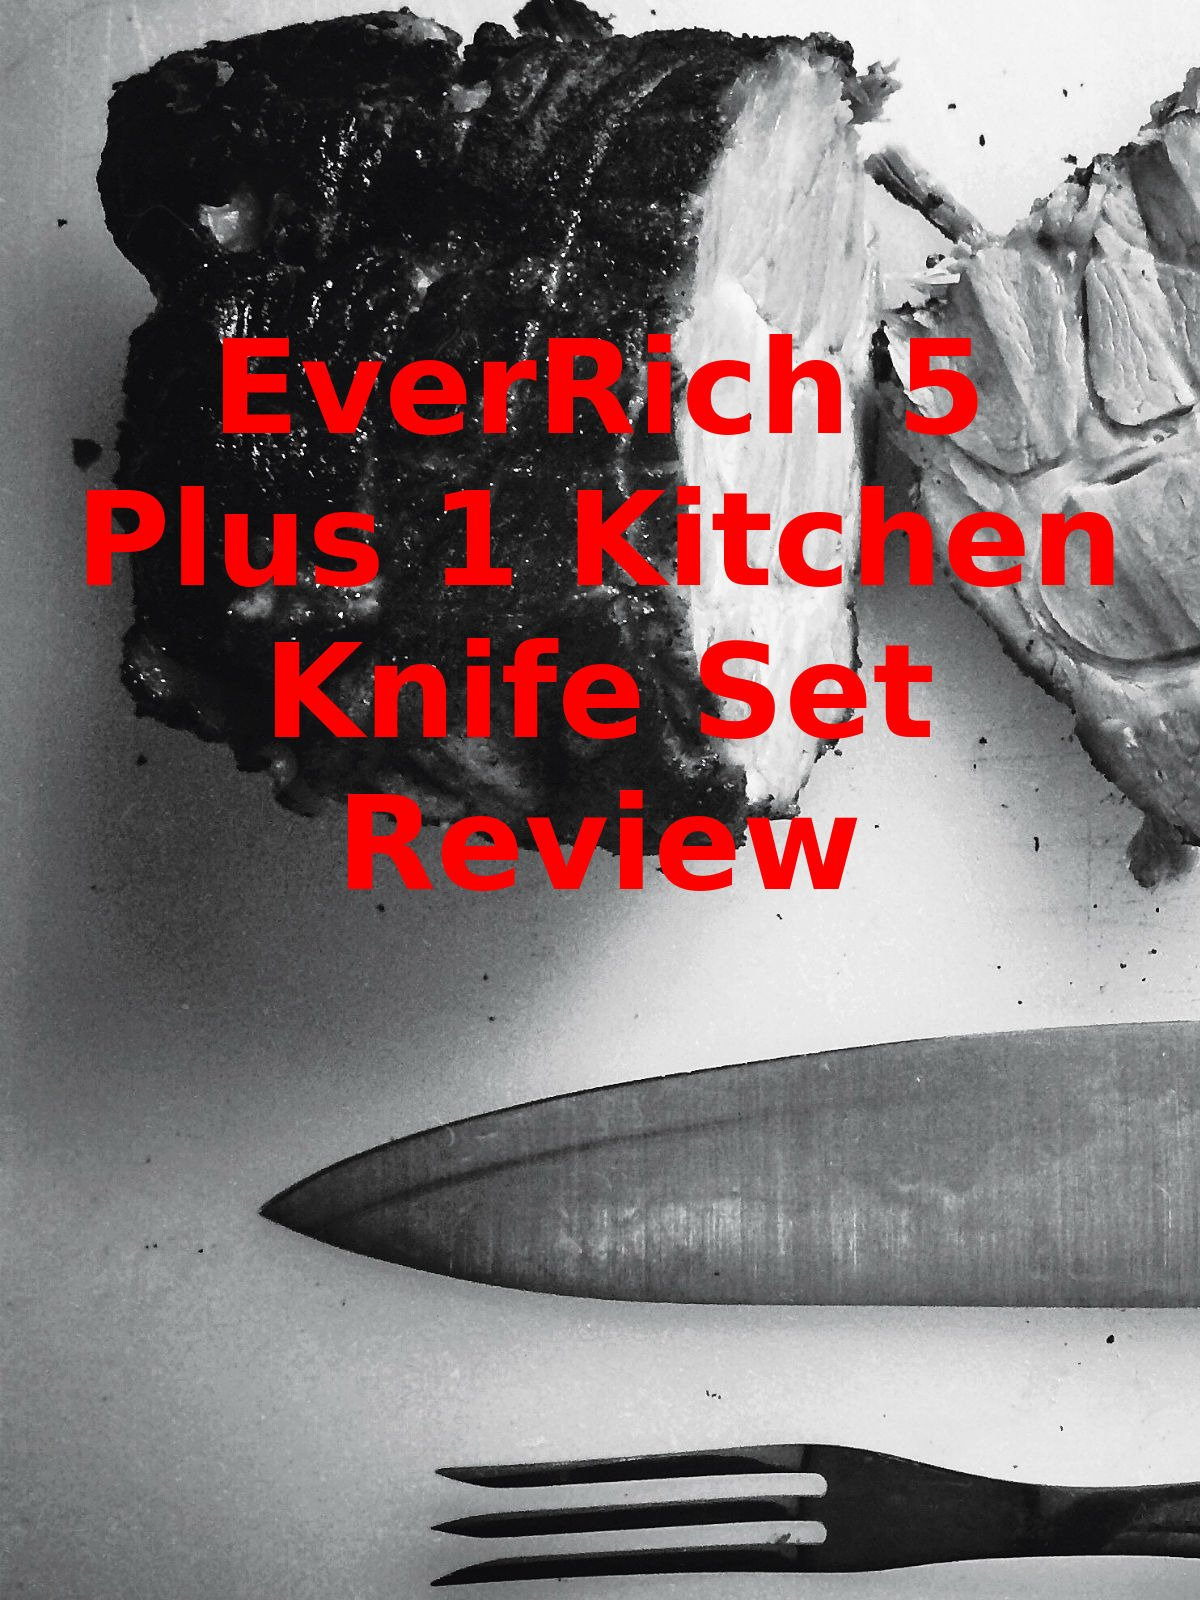 Review: EverRich 5 Plus 1 Kitchen Knife Set Review